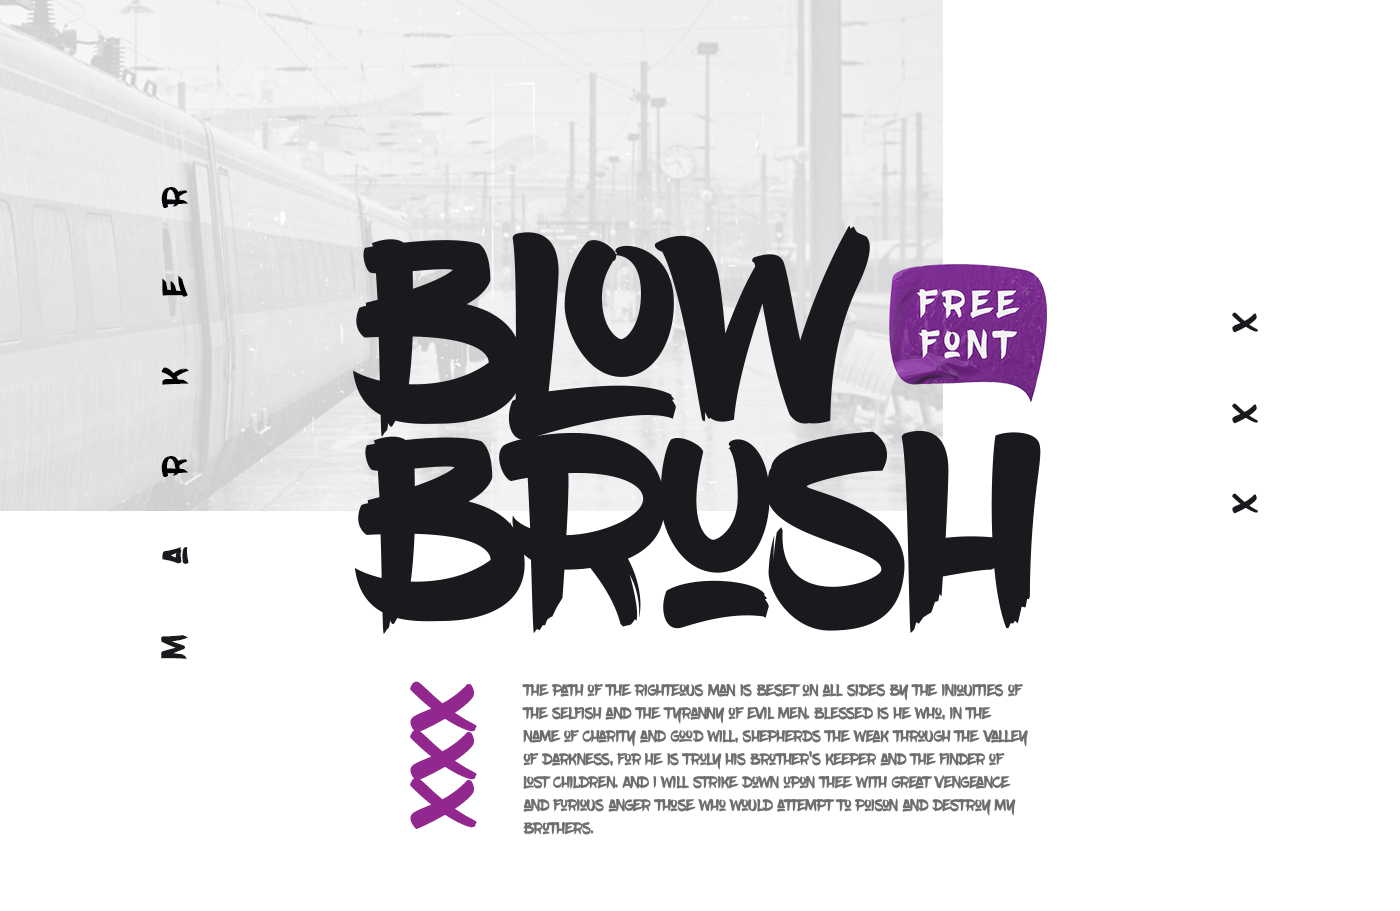 font type Marker brush text Headline dirty Urban Street hip-hop Handstyle